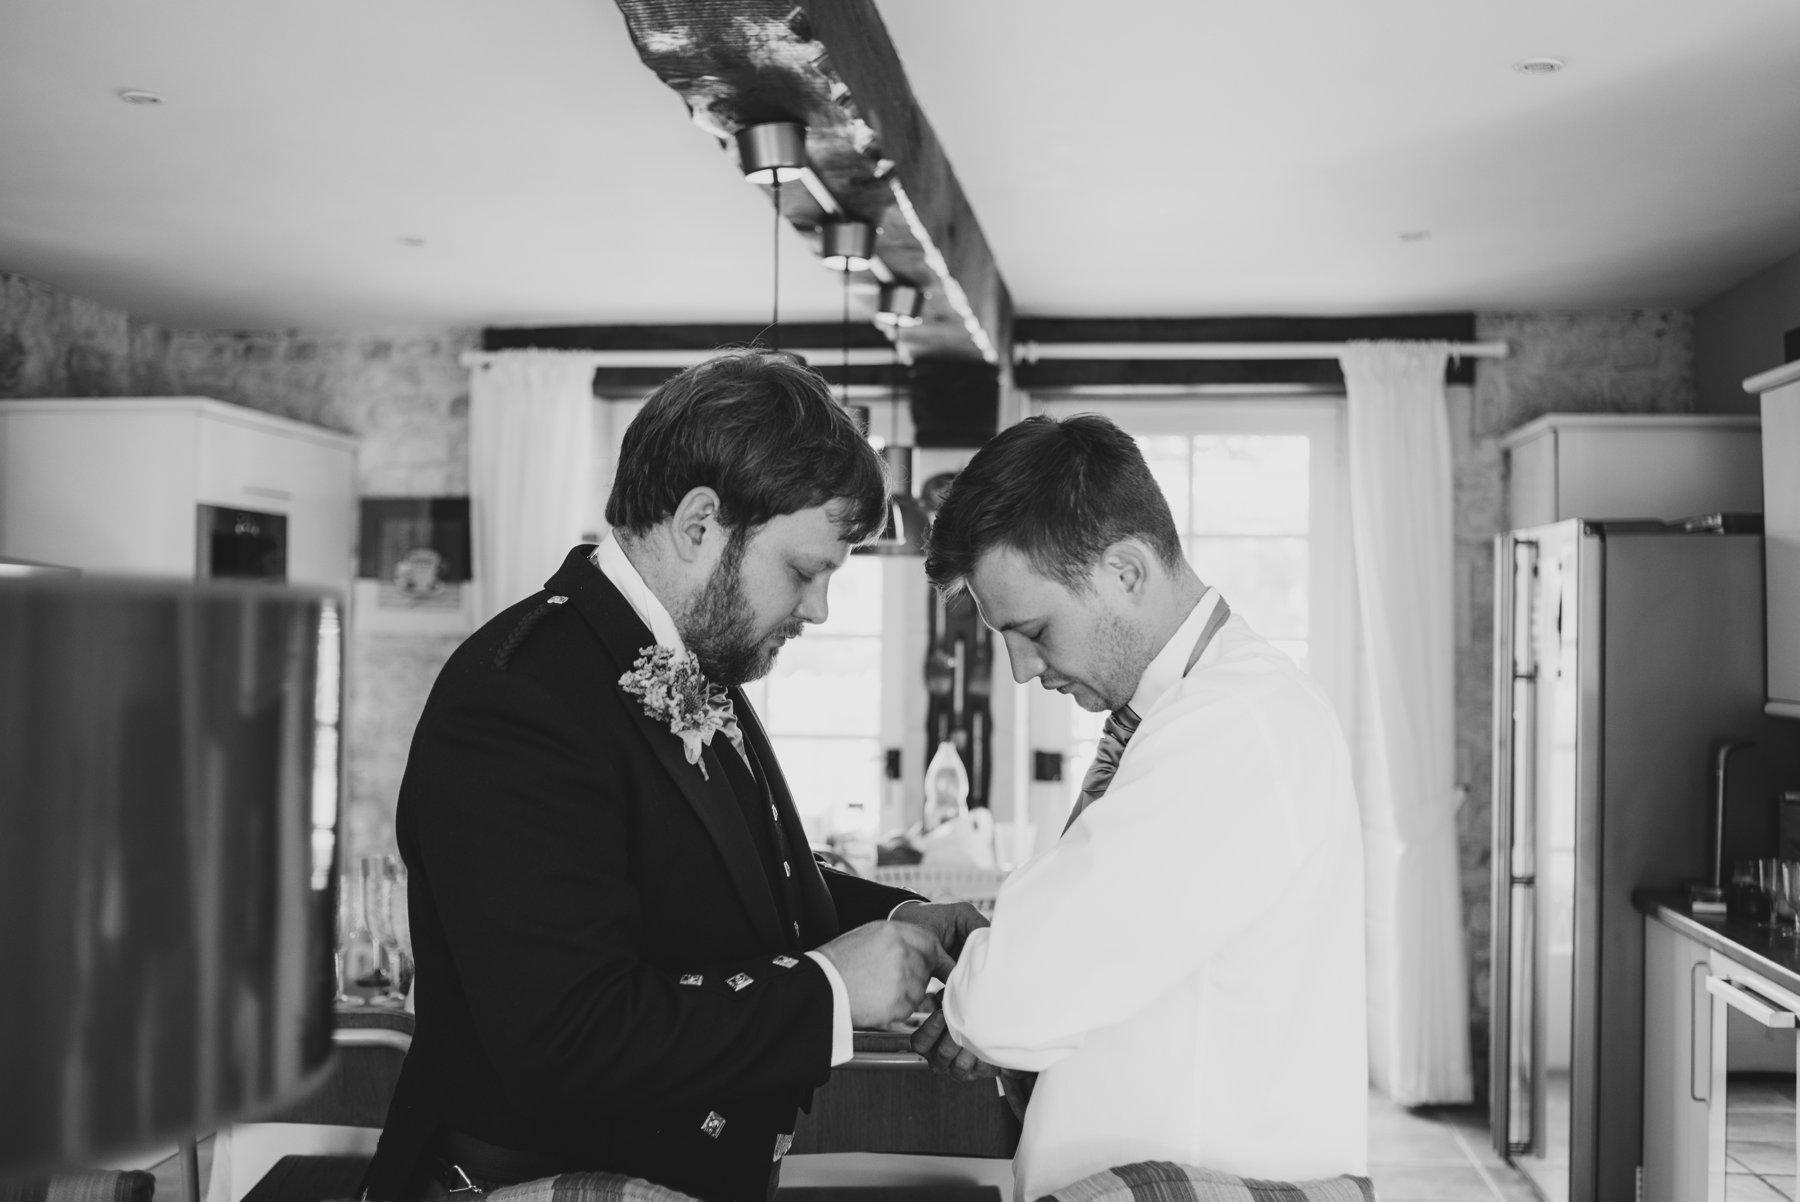 petitmoulin_france_bordeaux_weddings_0012